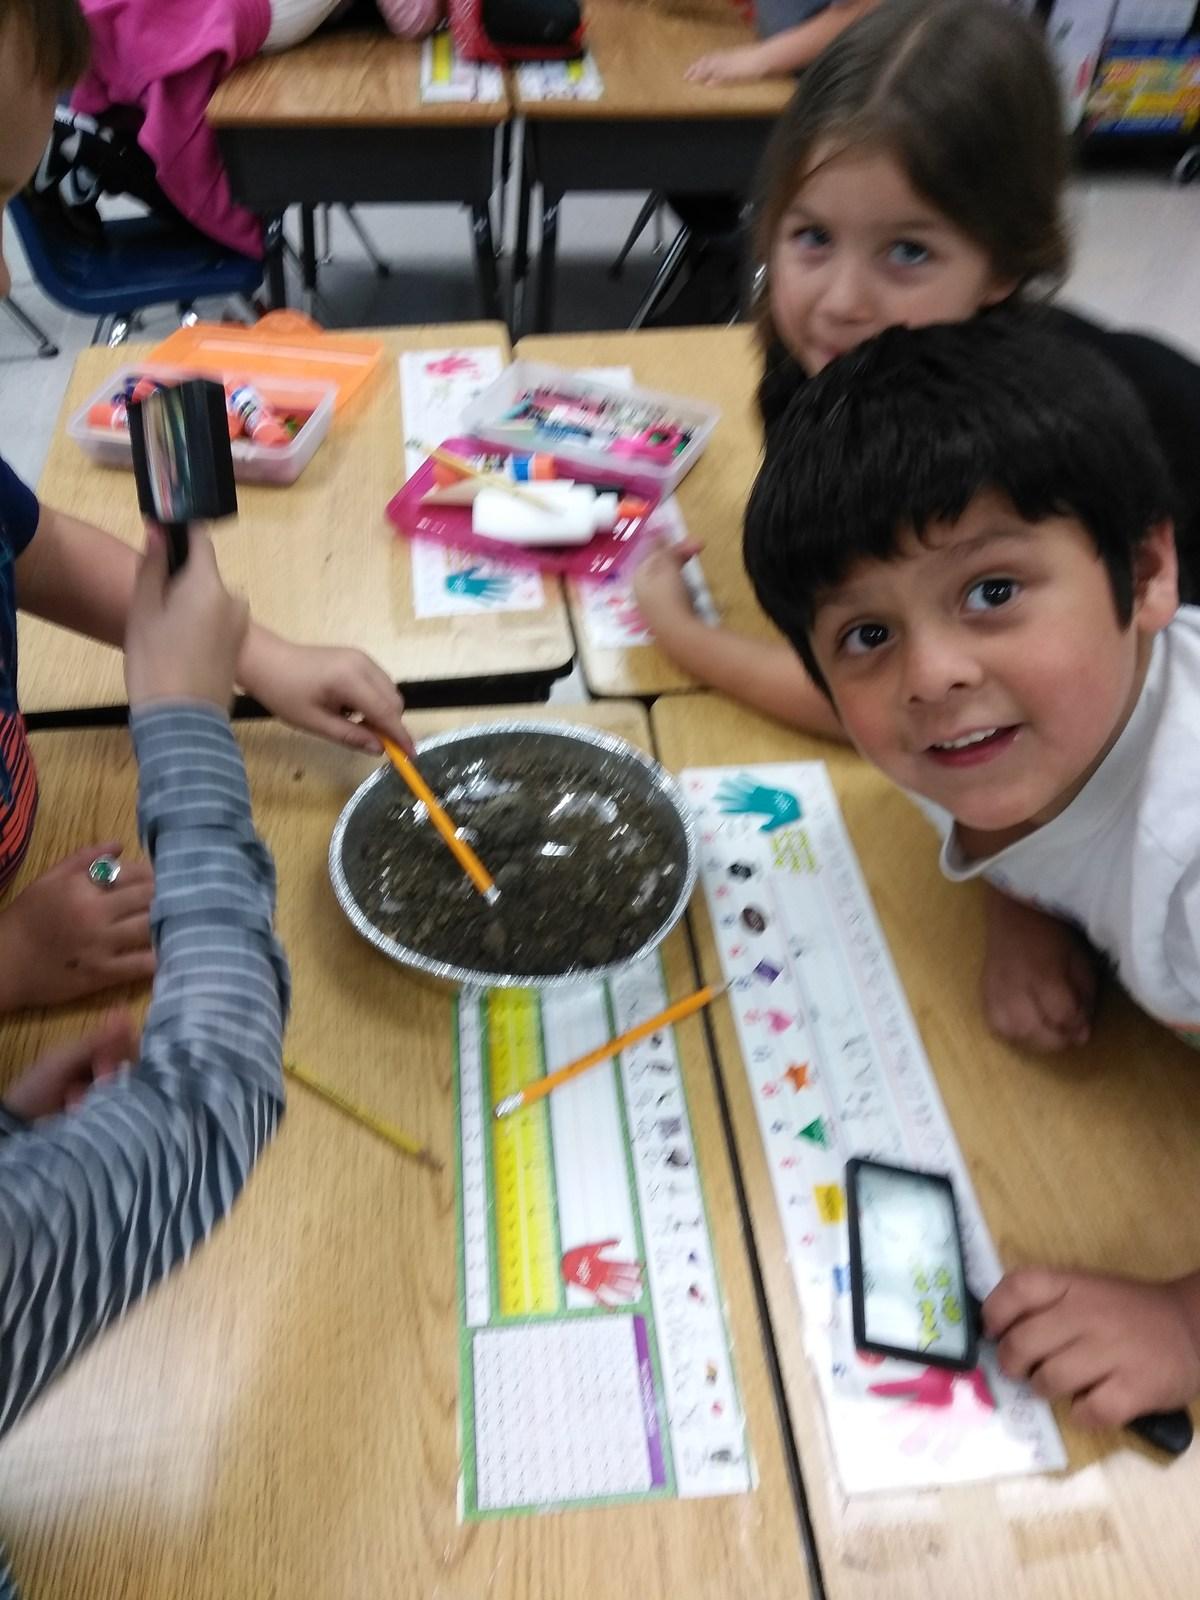 Mr  Delacruz in Wonderful 1B! – David Delacruz – Dunaway Elementary